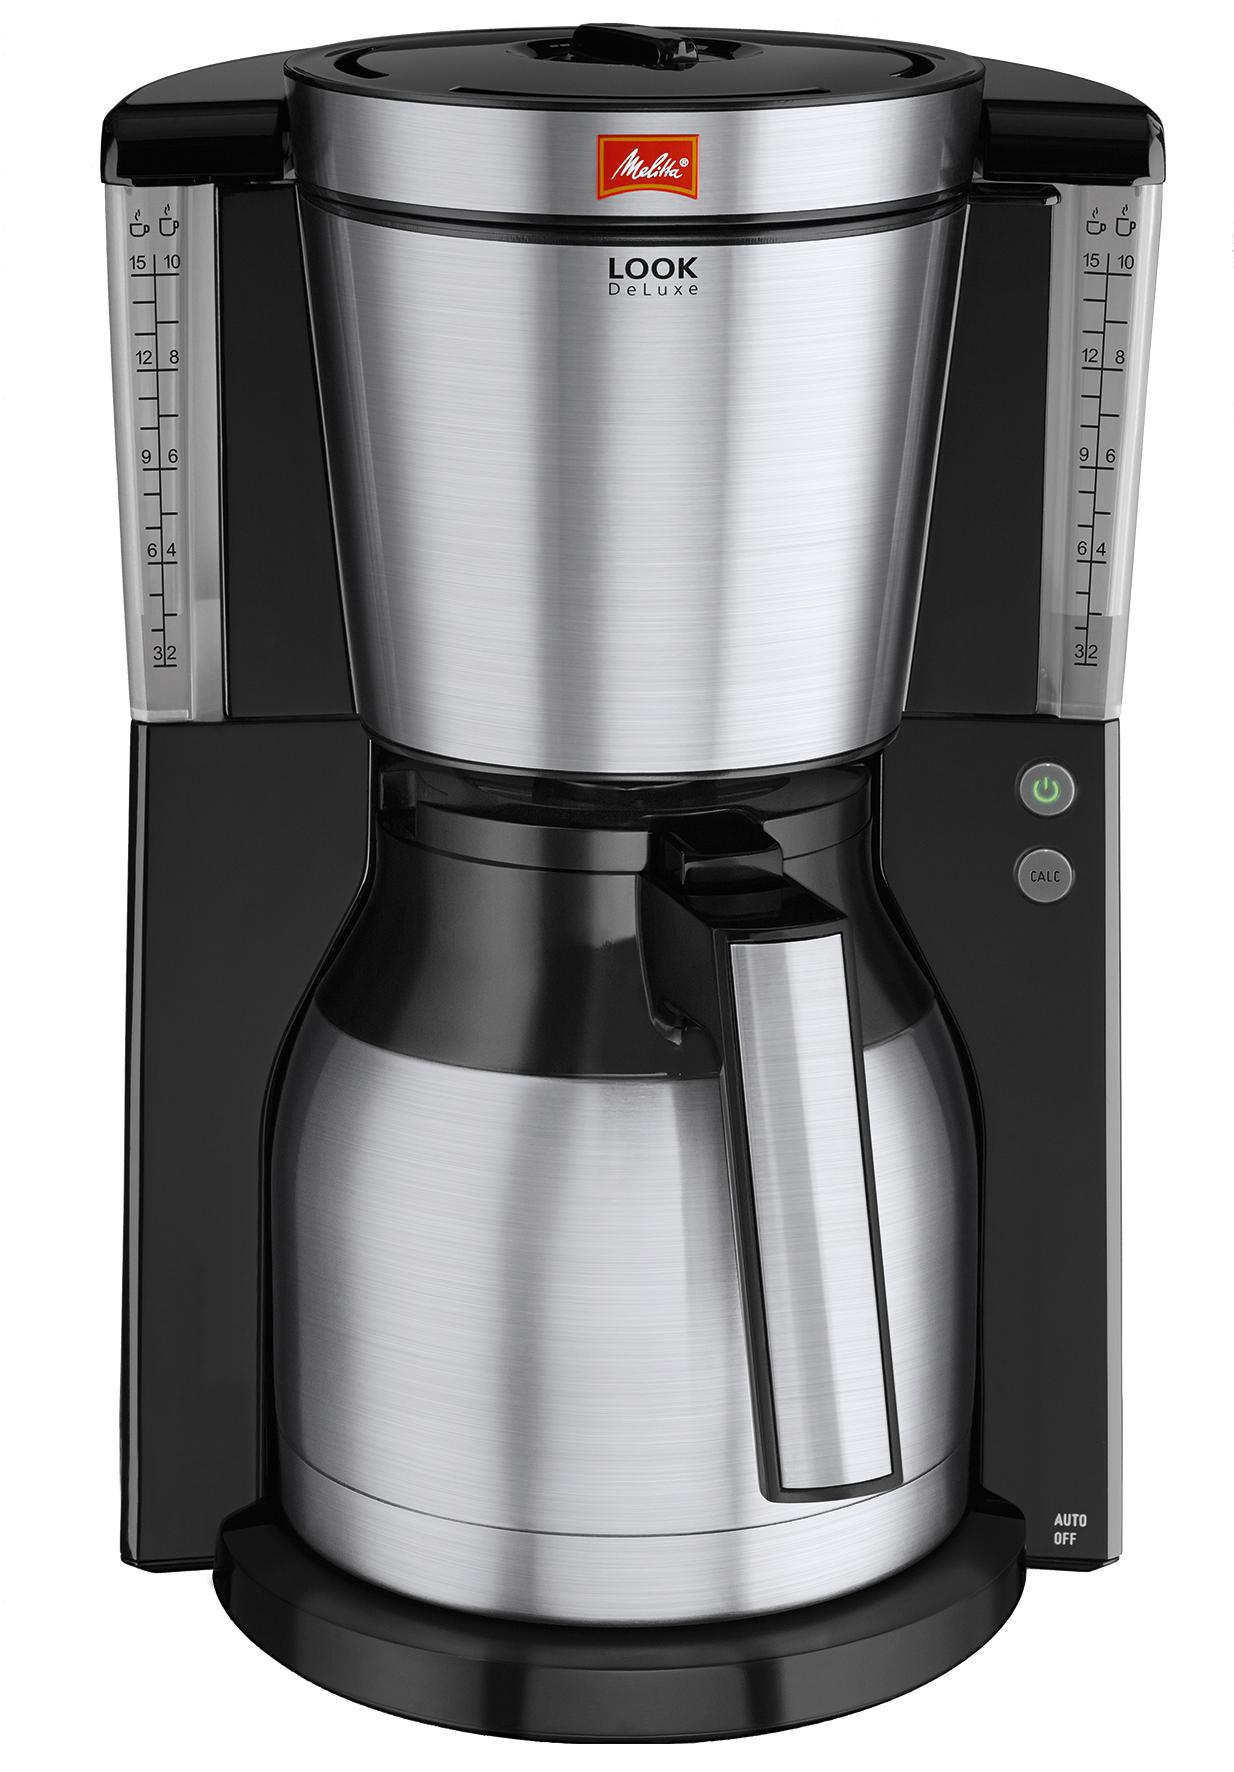 melitta kaffeemaschine look therm deluxe edelstahlblenden aromaselector. Black Bedroom Furniture Sets. Home Design Ideas